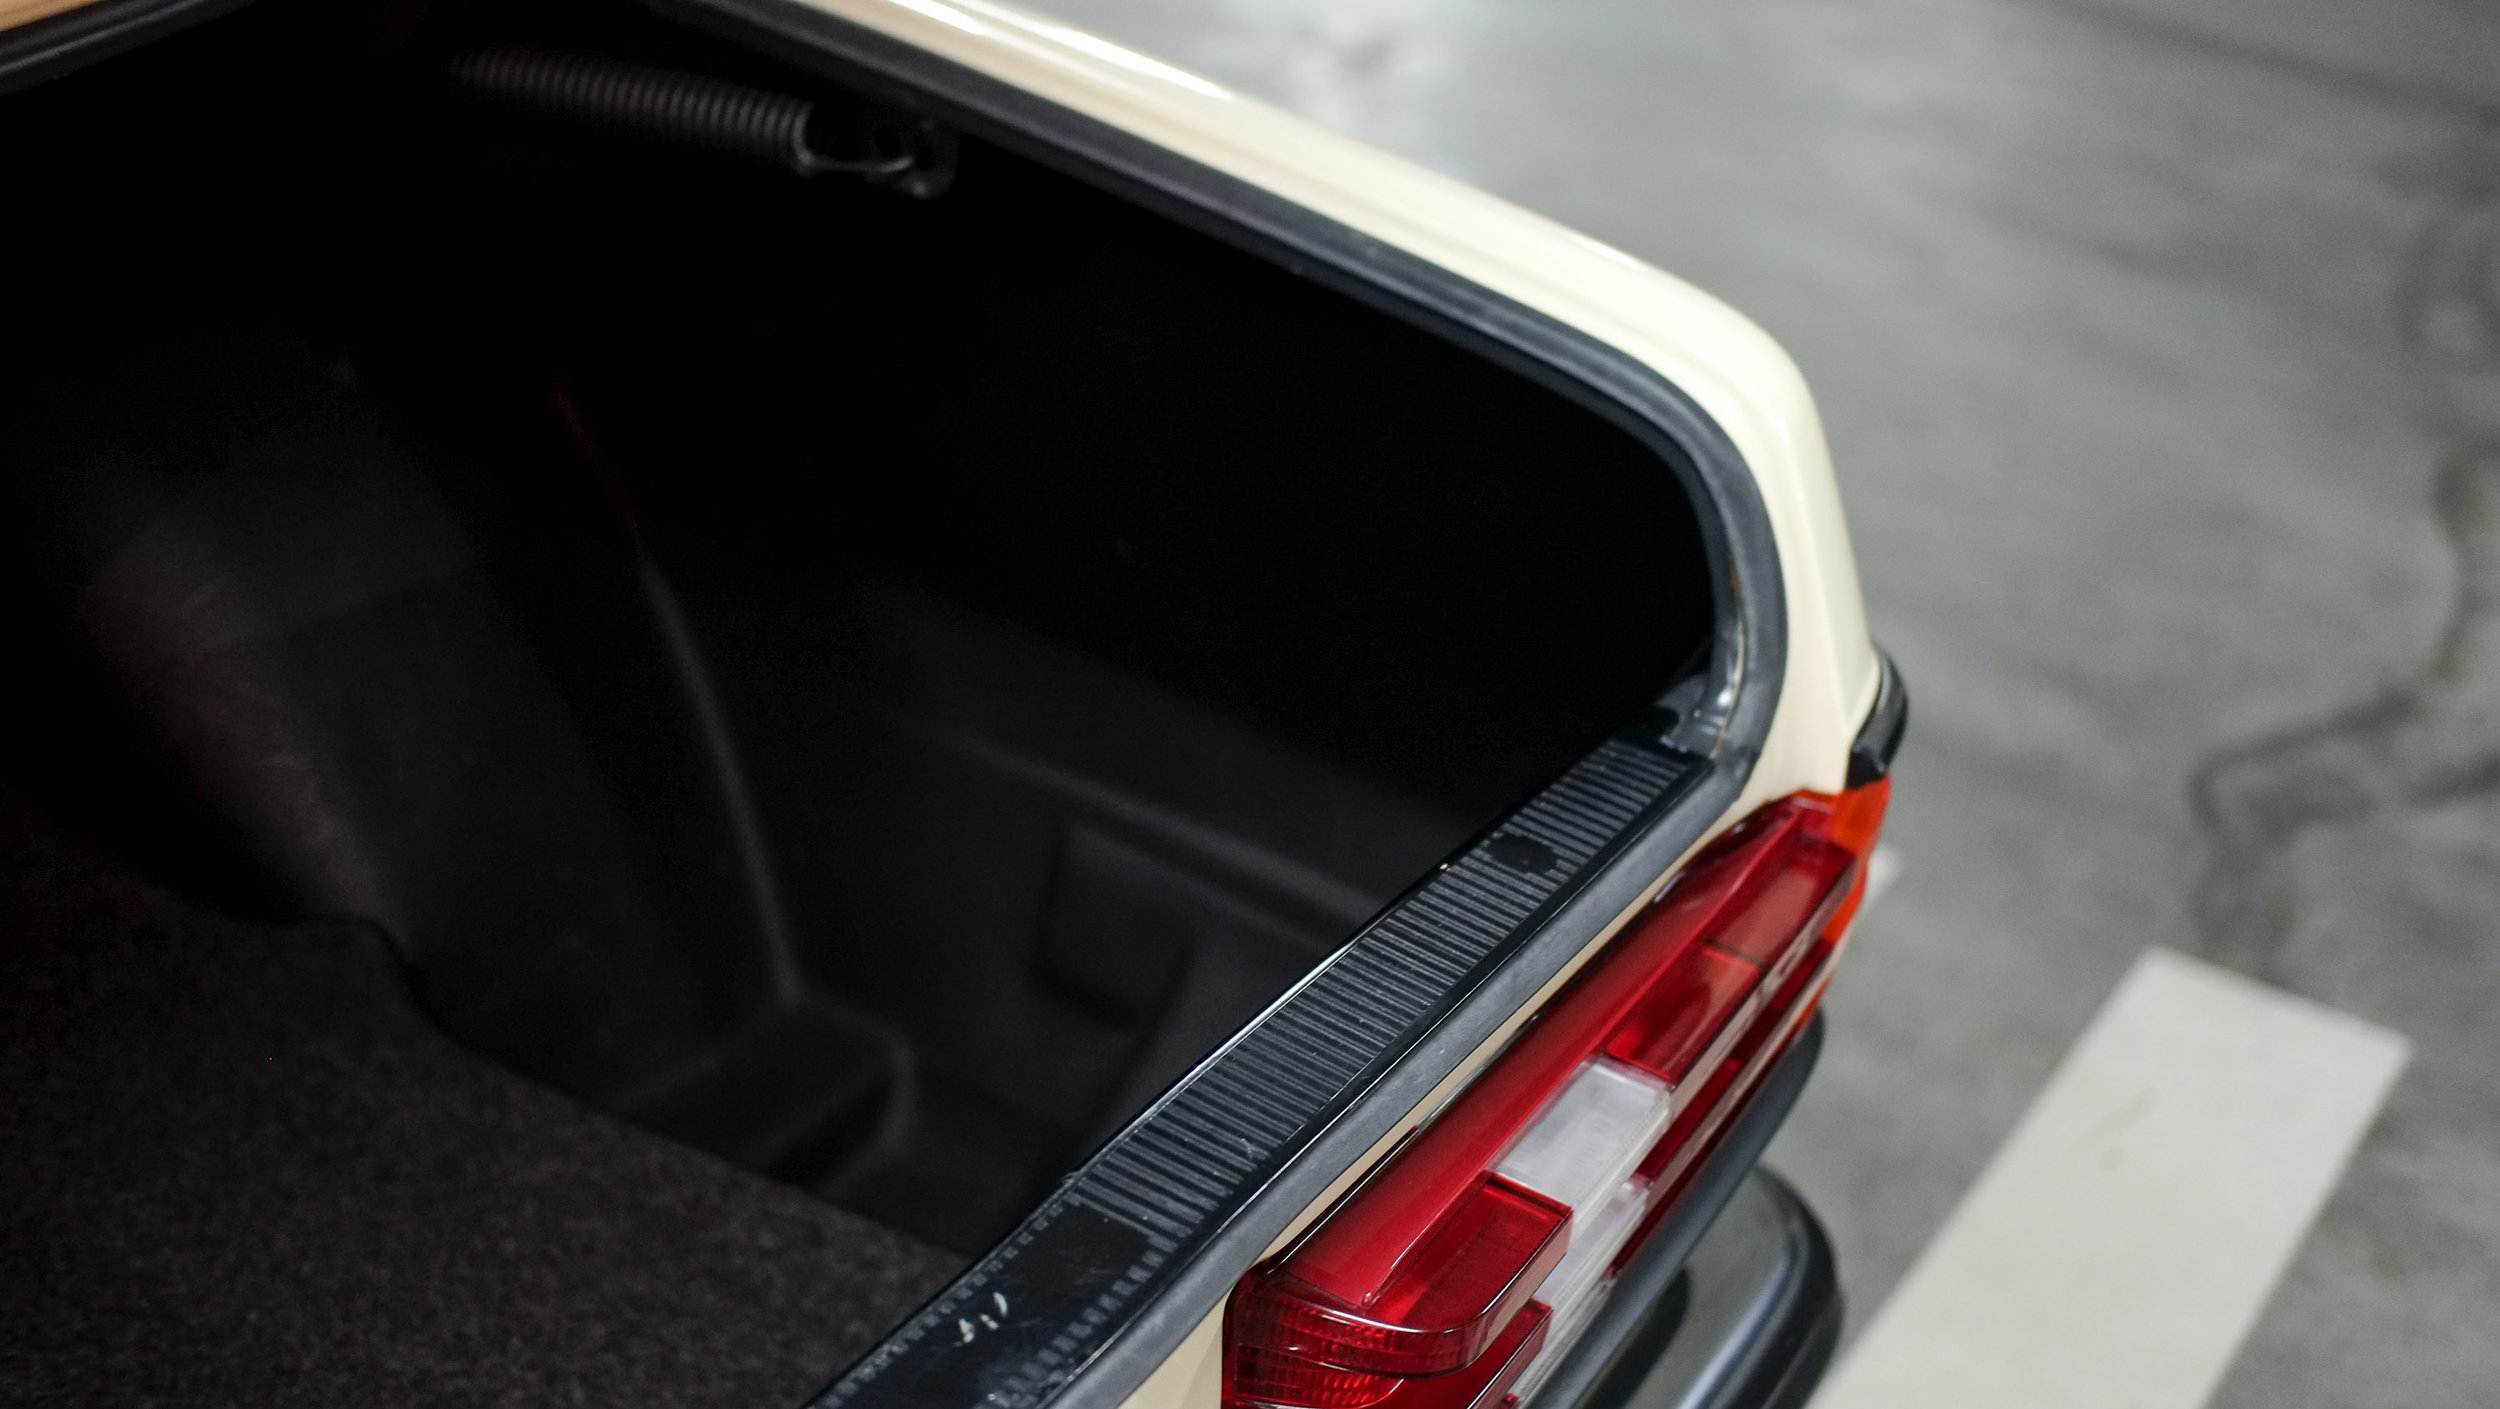 coolnvintage Mercedes-Benz W123 300D (9 of 59).jpg